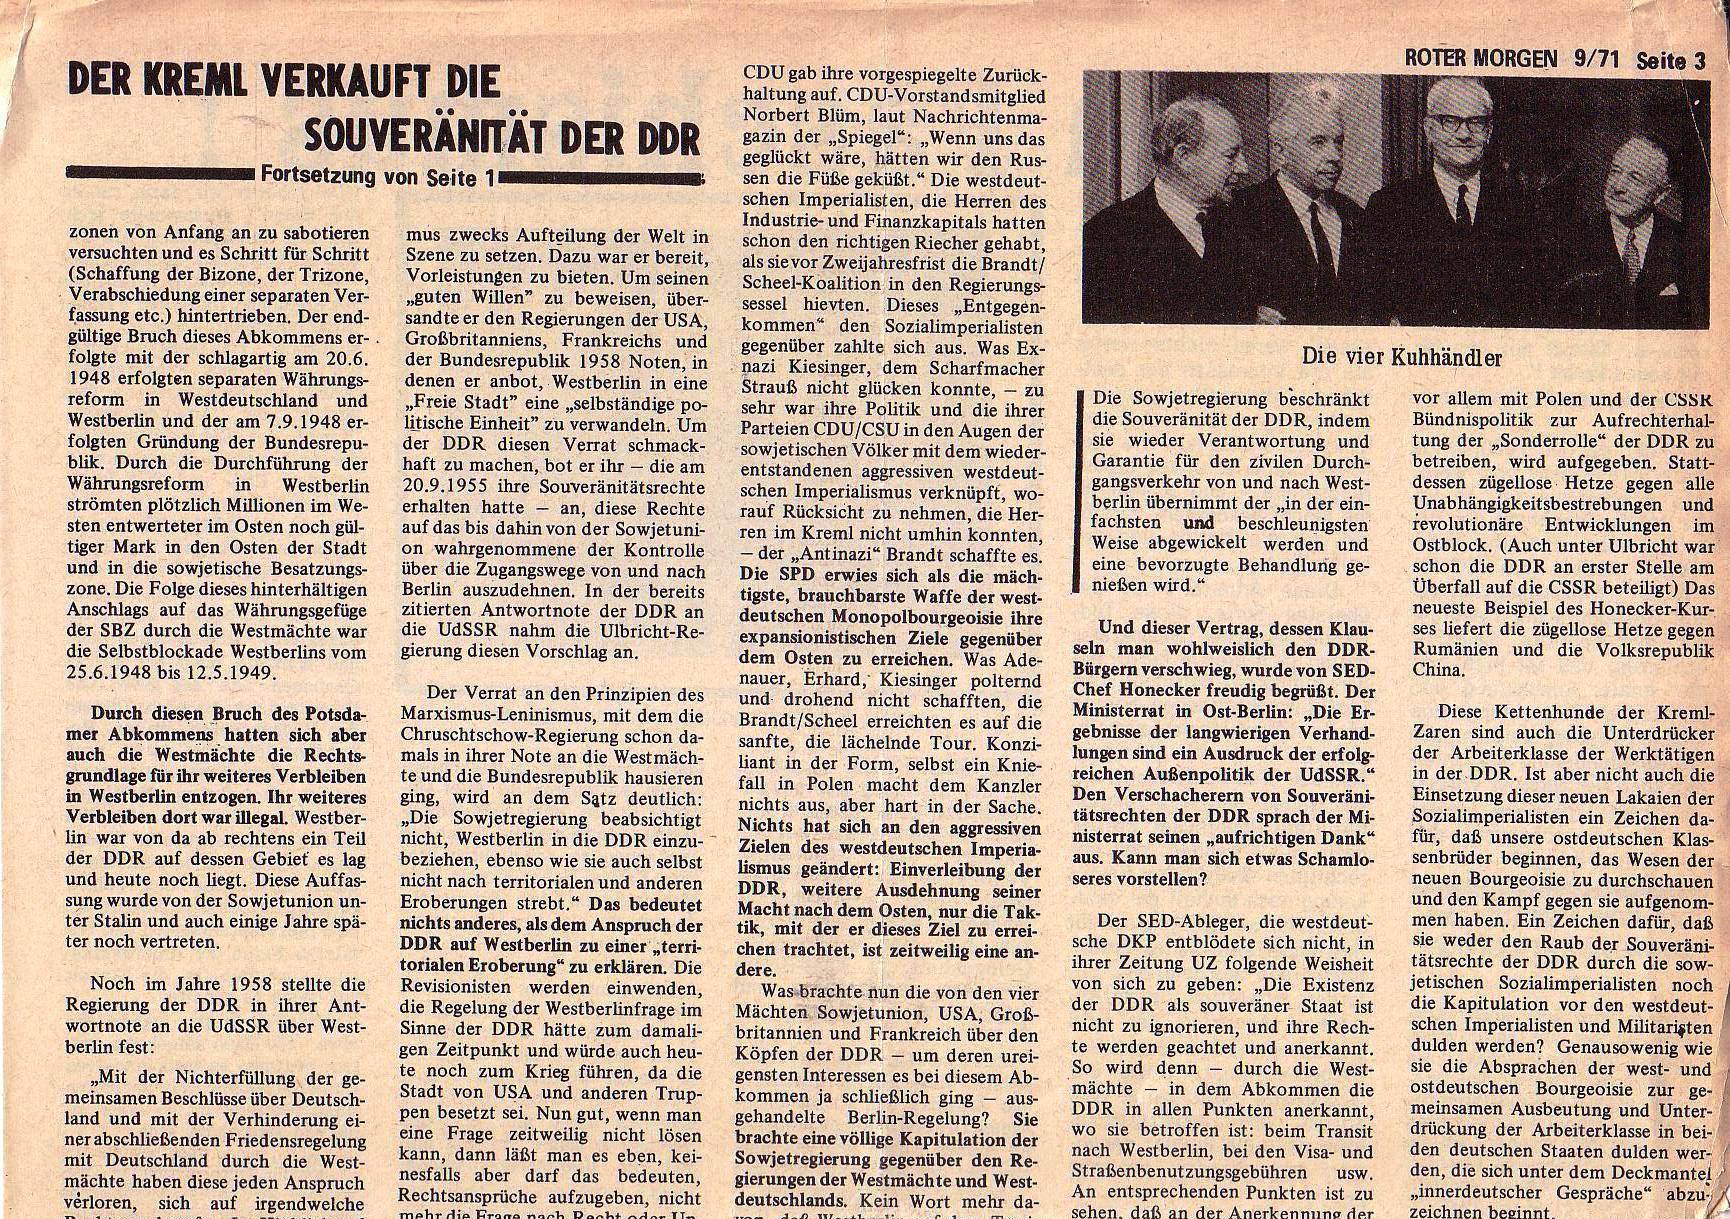 Roter Morgen, 5. Jg., 13. September 1971, Nr. 9, Seite 3a